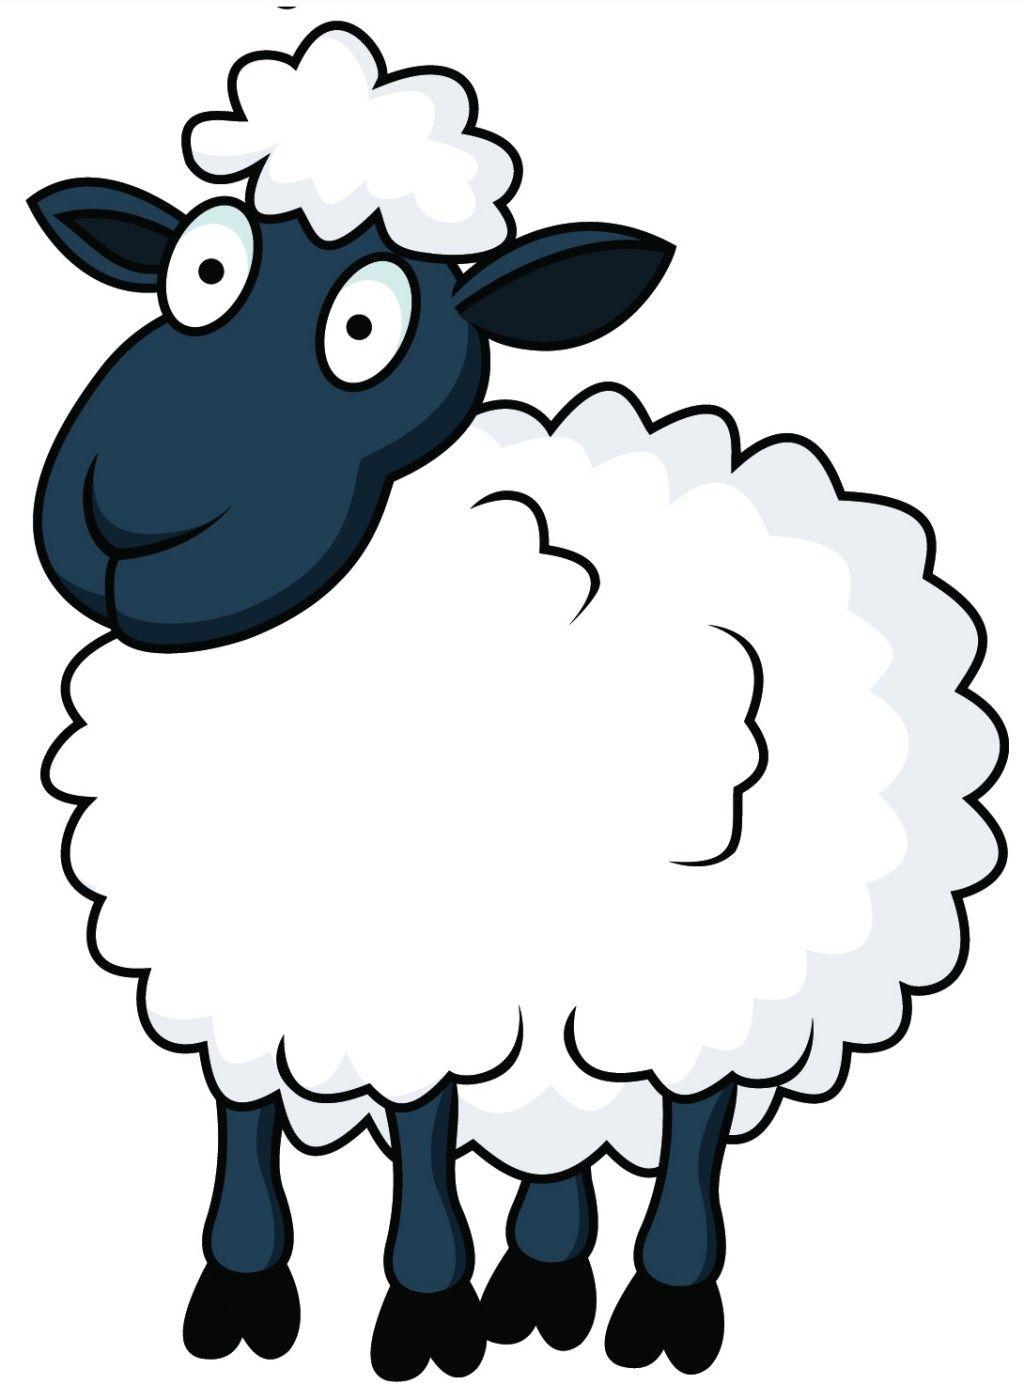 funny-eid-ul-adha-sheep-cartoon-picture-15.jpg (15×15)  Schafe